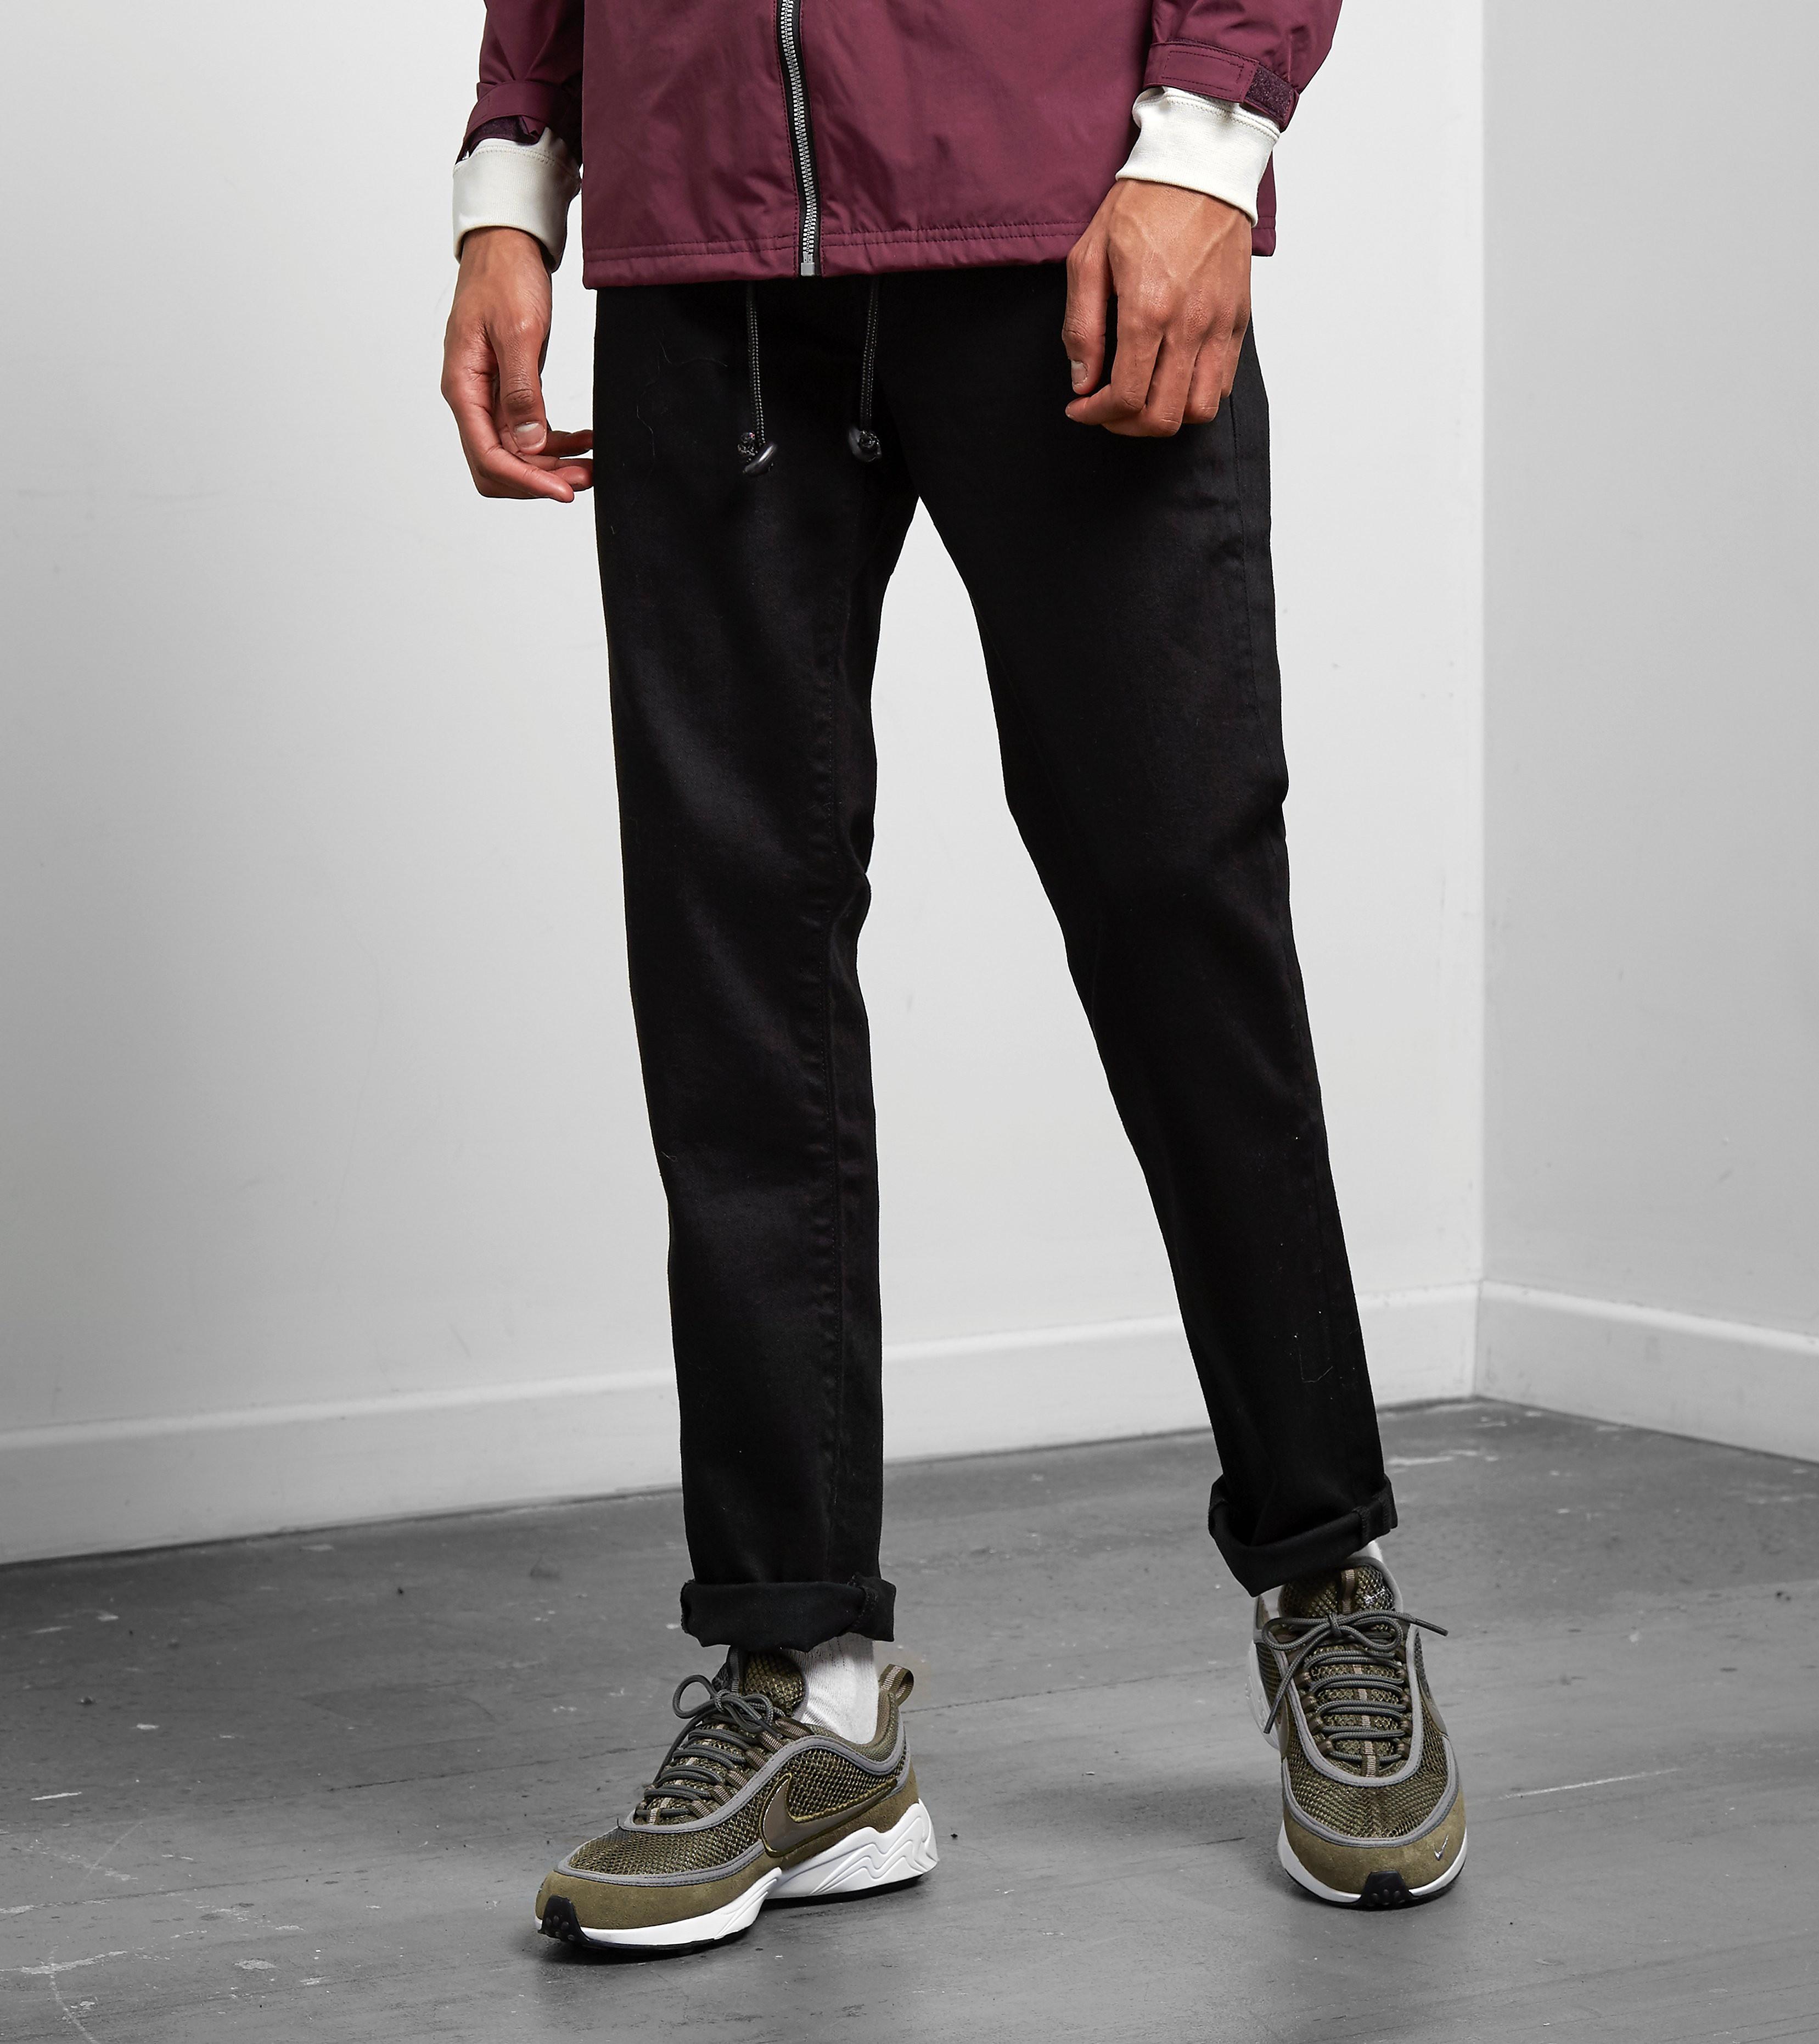 Levis 511 Nightshine Slim Fit Jean